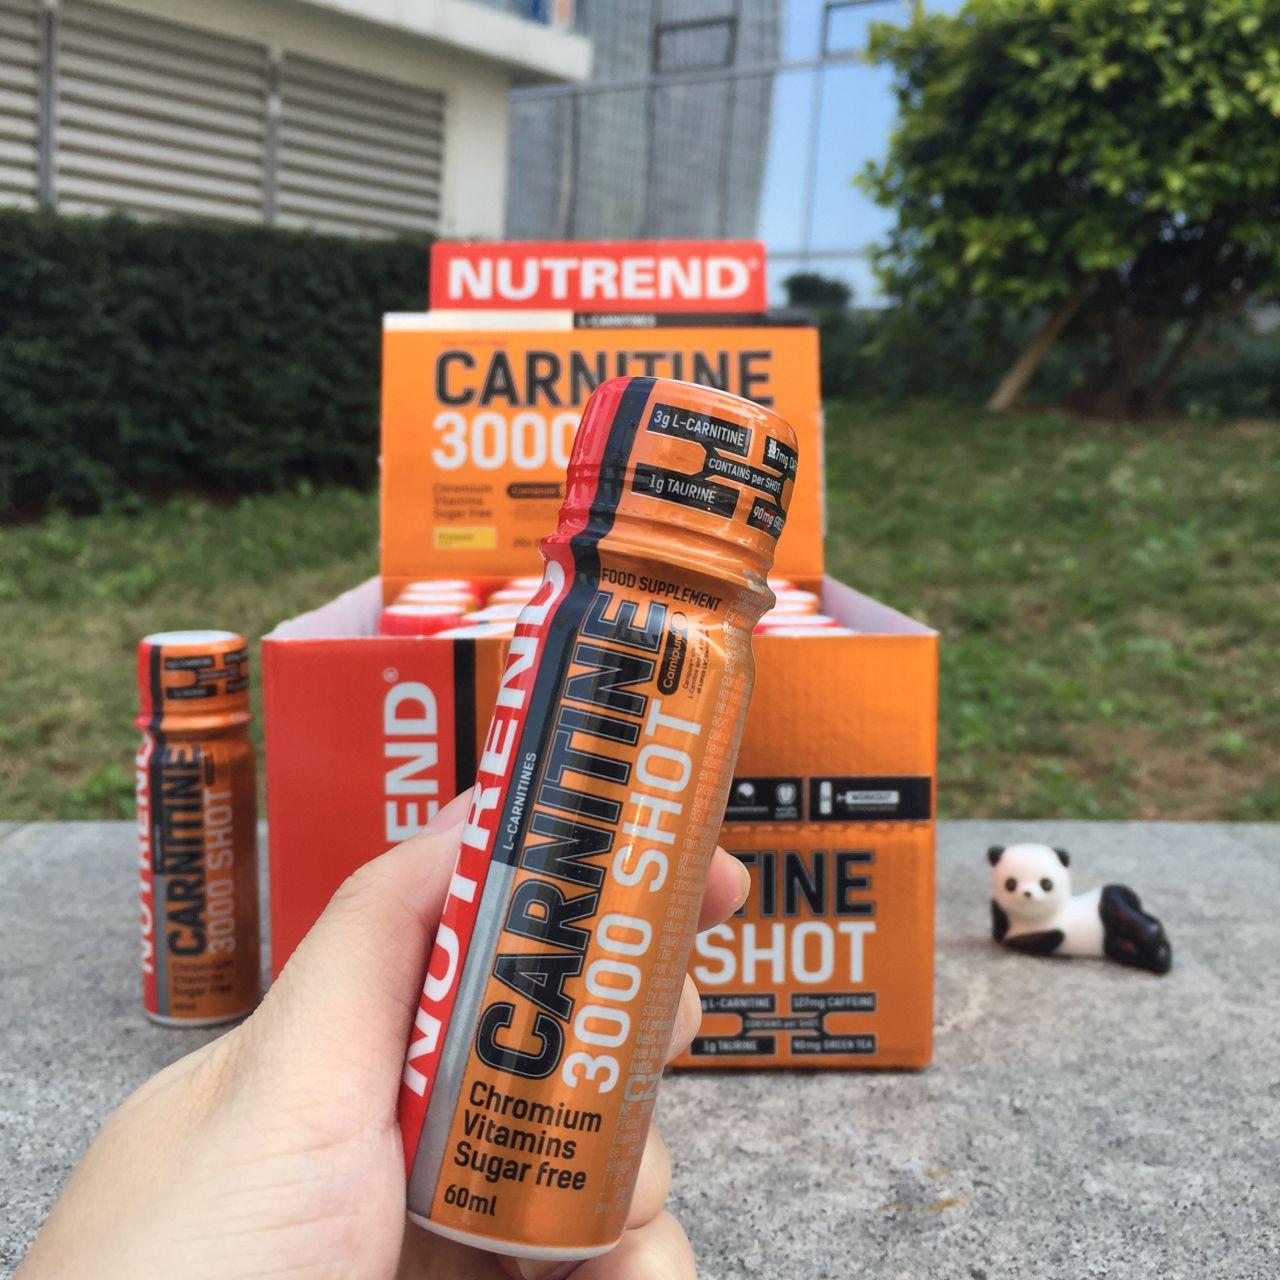 NUTREND - CARNITINE 3000 SHOT - 20 X 60 ML